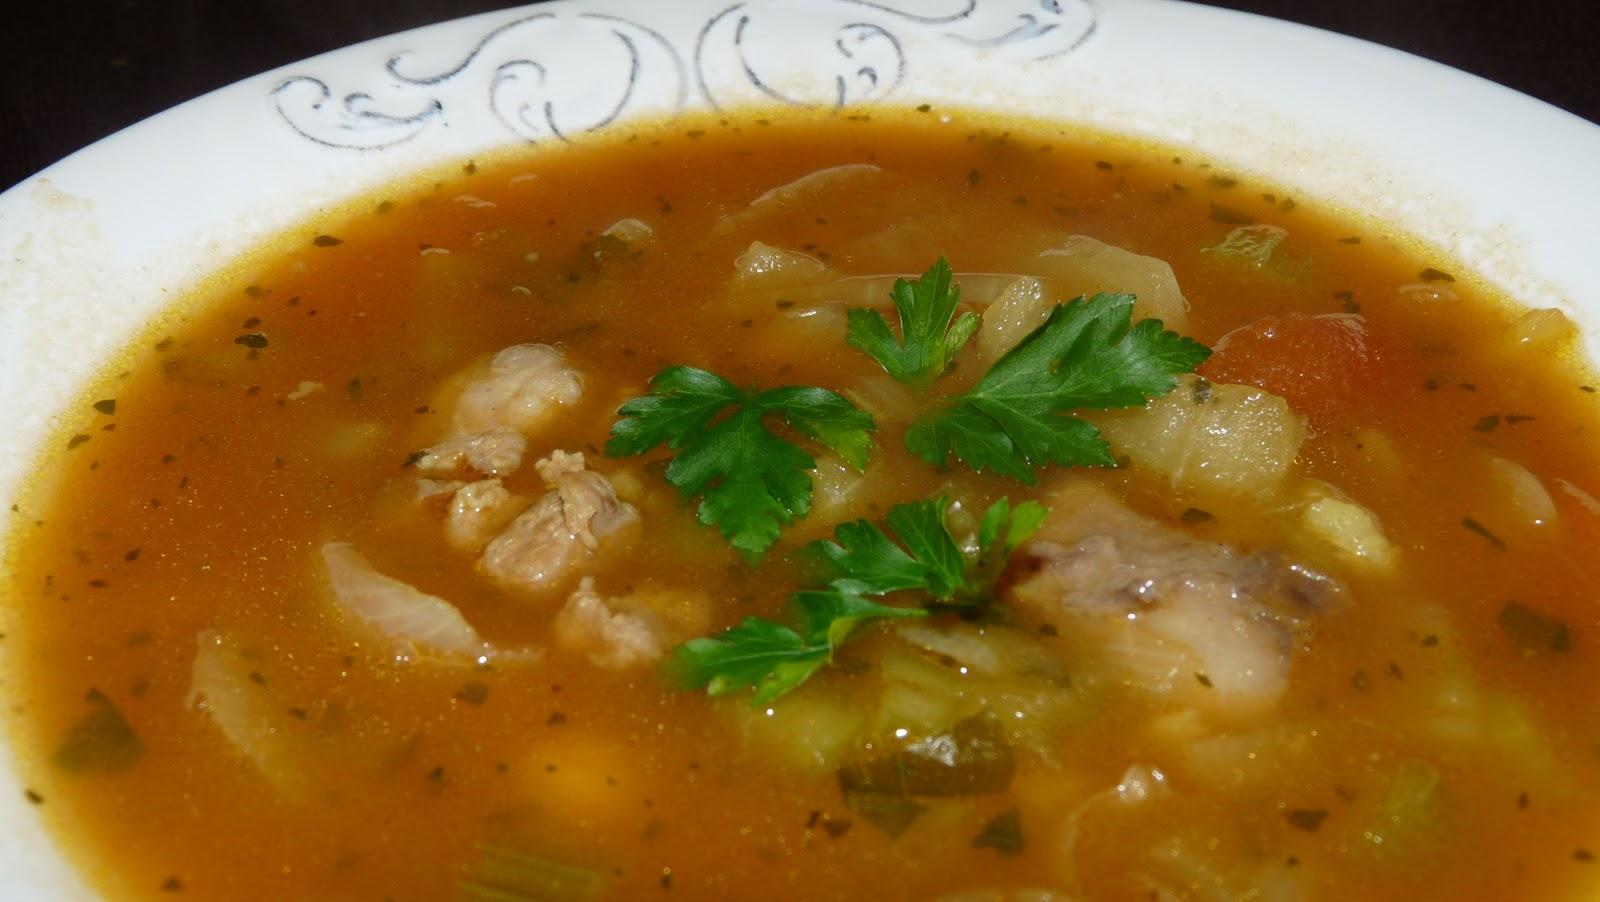 Gourmandise et cuisine harira - Cuisine et gourmandise ...